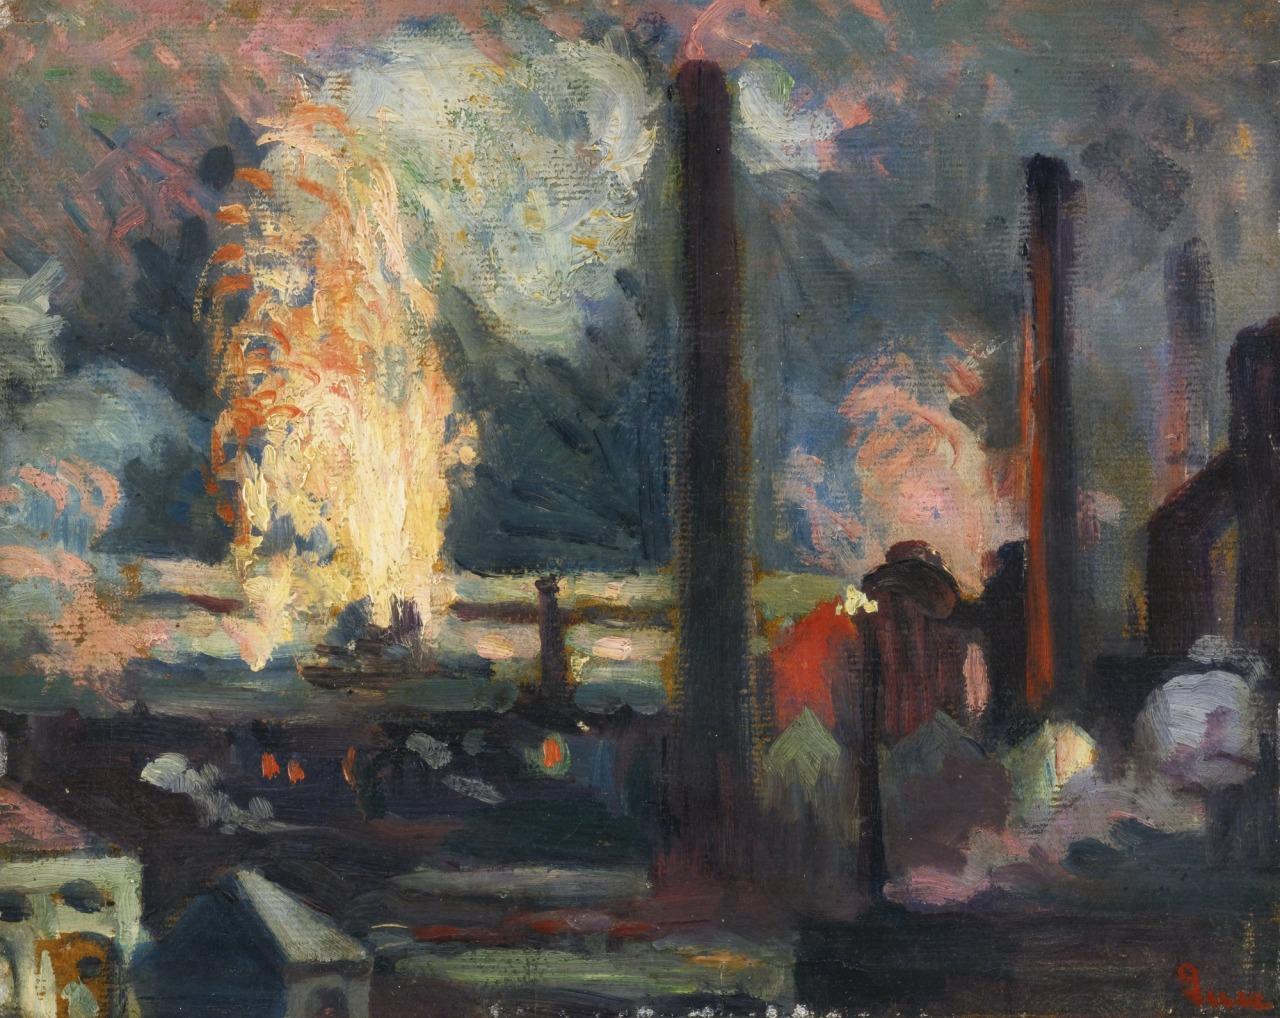 lawrenceleemagnuson:Maximilian Luce (France 1858-1941)Usines, la Nuit - Factories, the Night oil on paper mounted on canvas 22 x 27cm